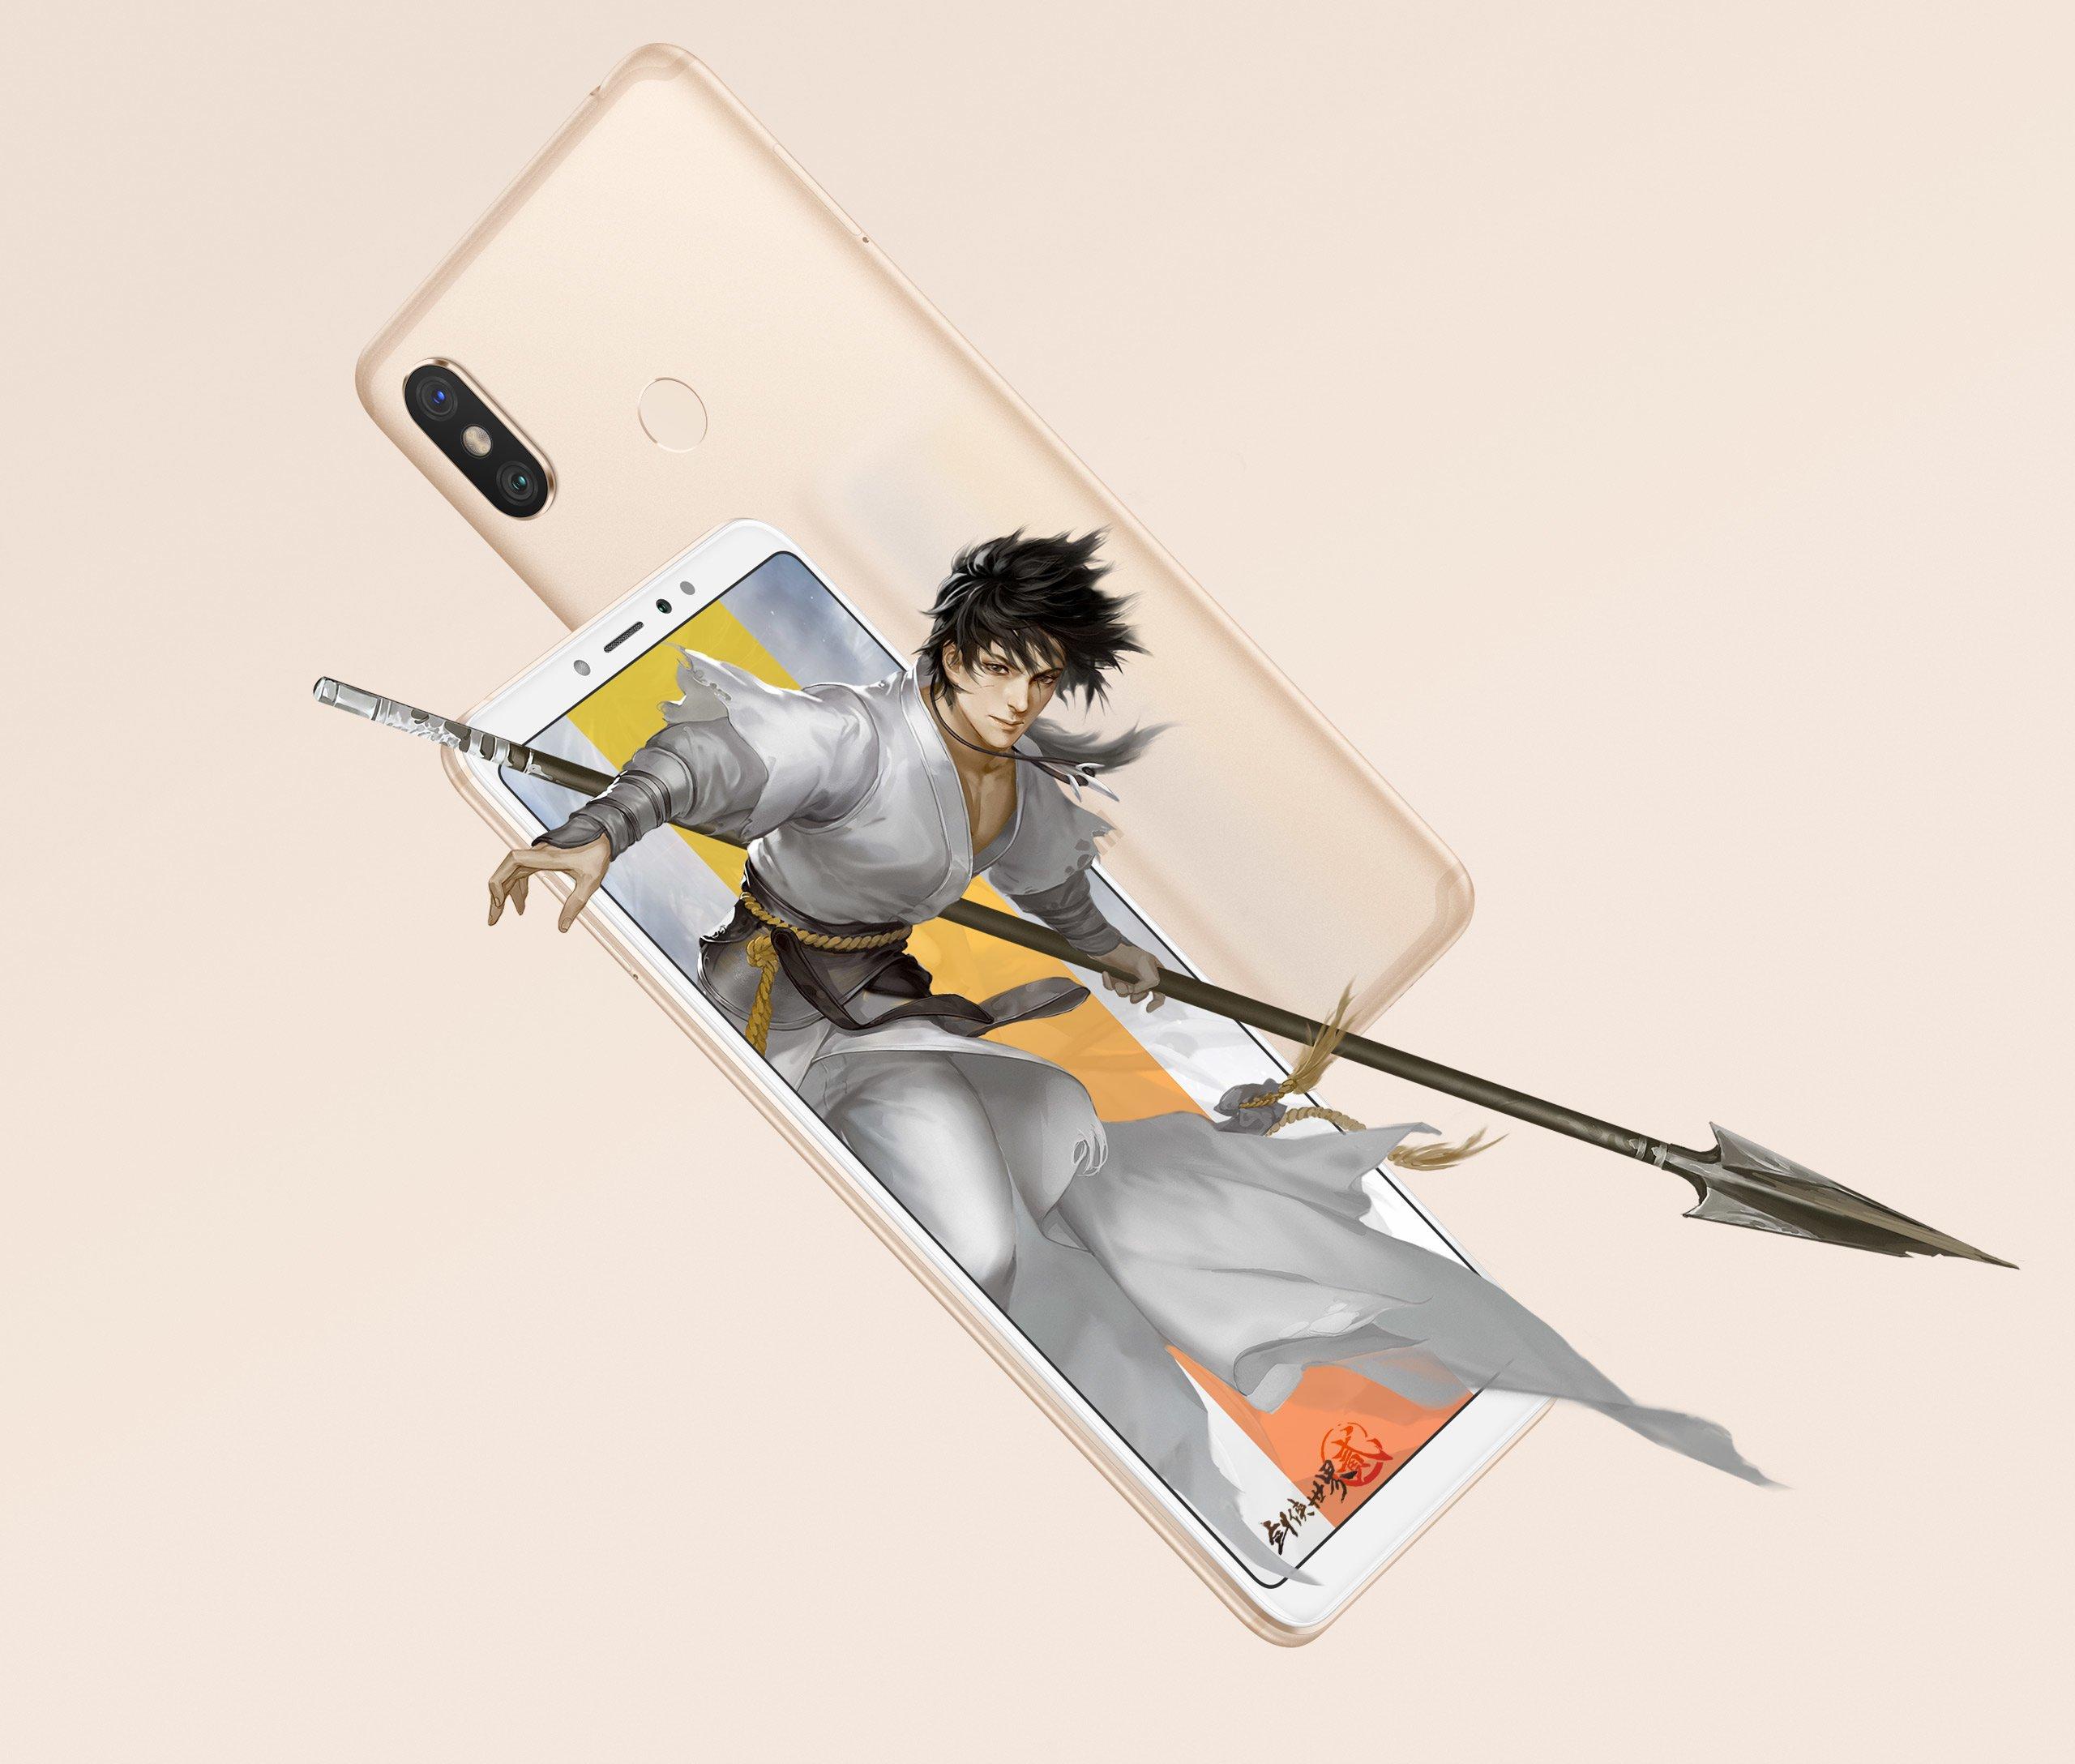 To już oficjalny koniec serii Xiaomi Mi Max 16